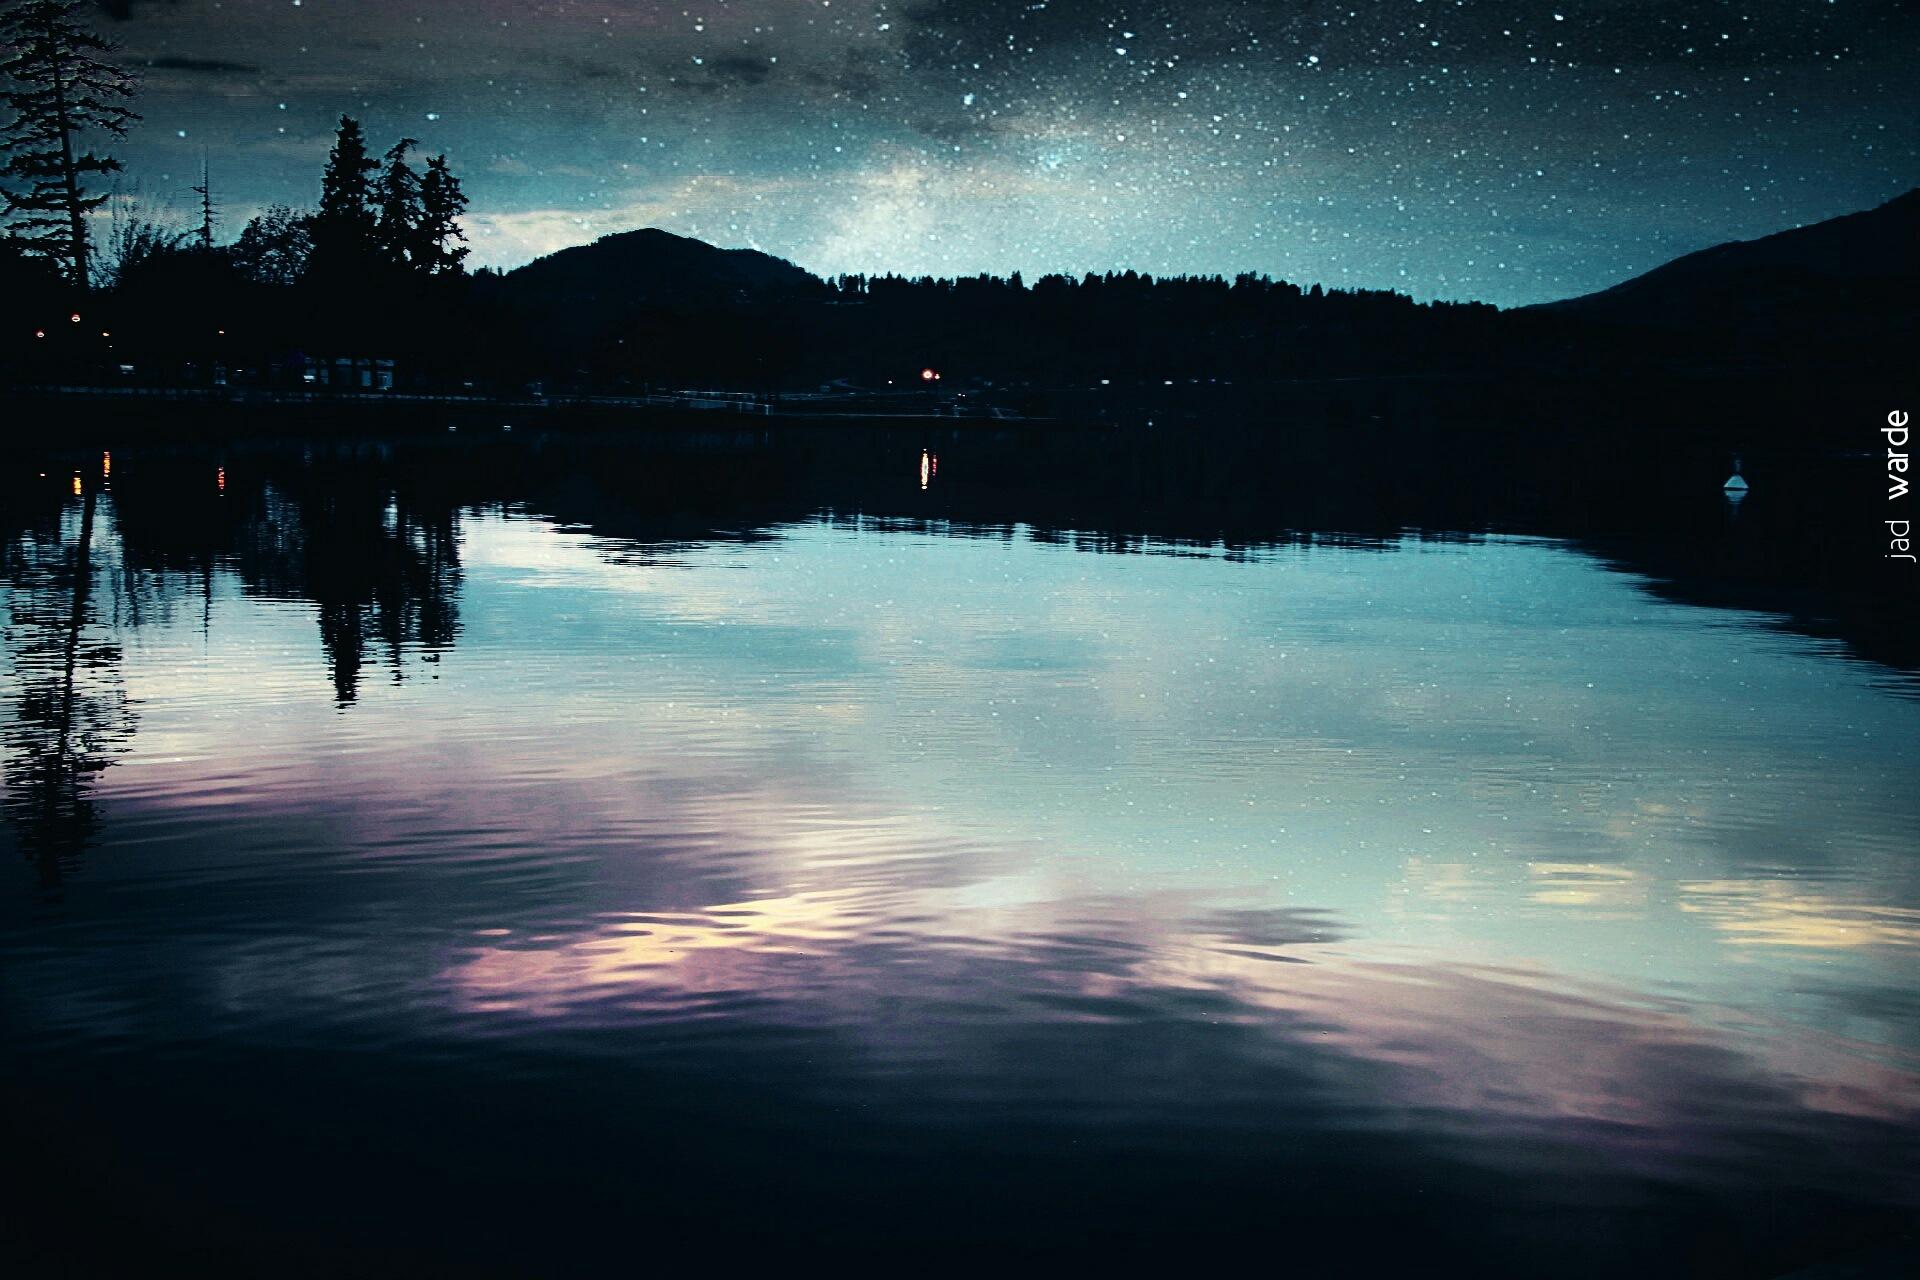 stars by Jad Warde